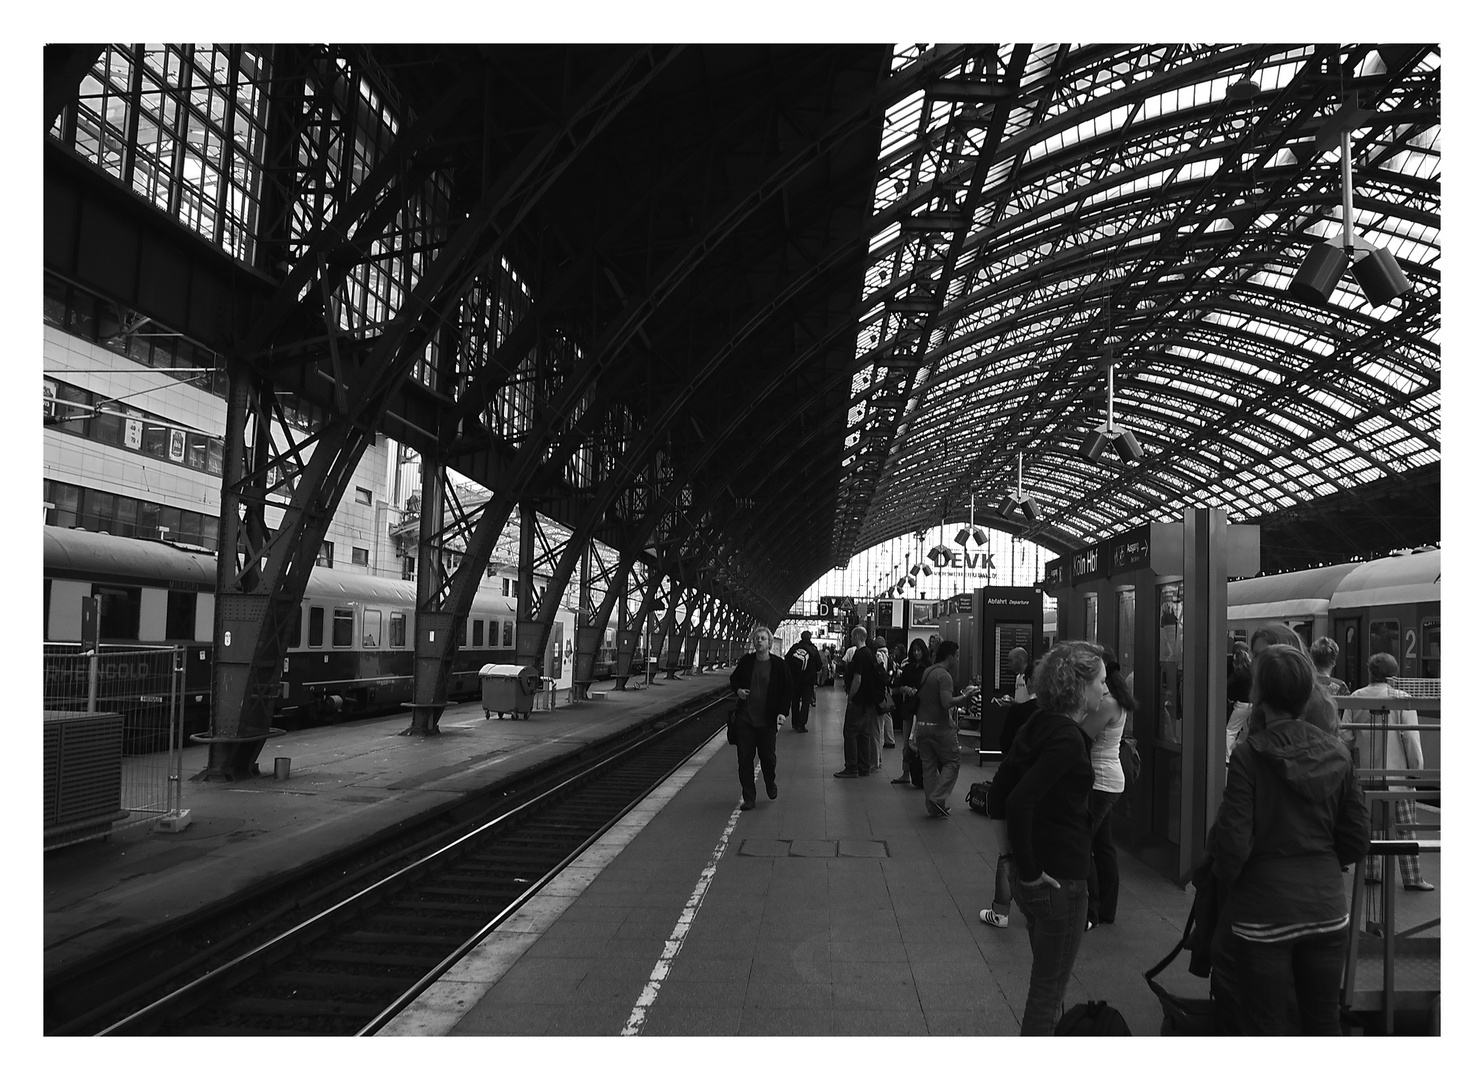 Station life